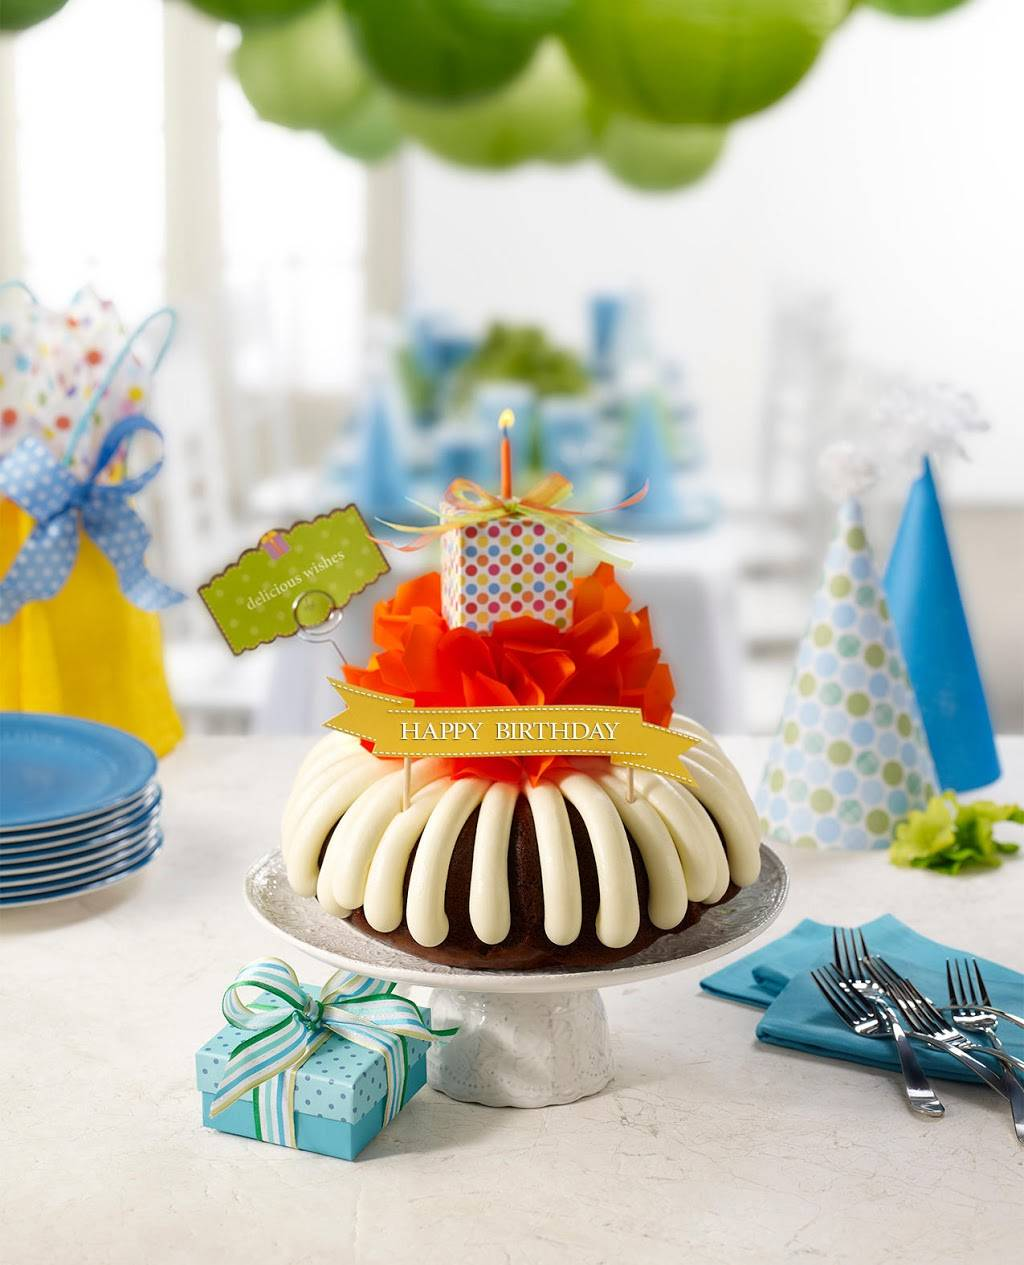 Nothing Bundt Cakes - bakery  | Photo 5 of 9 | Address: 2381, E University Dr Suite 90, Prosper, TX 75078, USA | Phone: (972) 598-9569